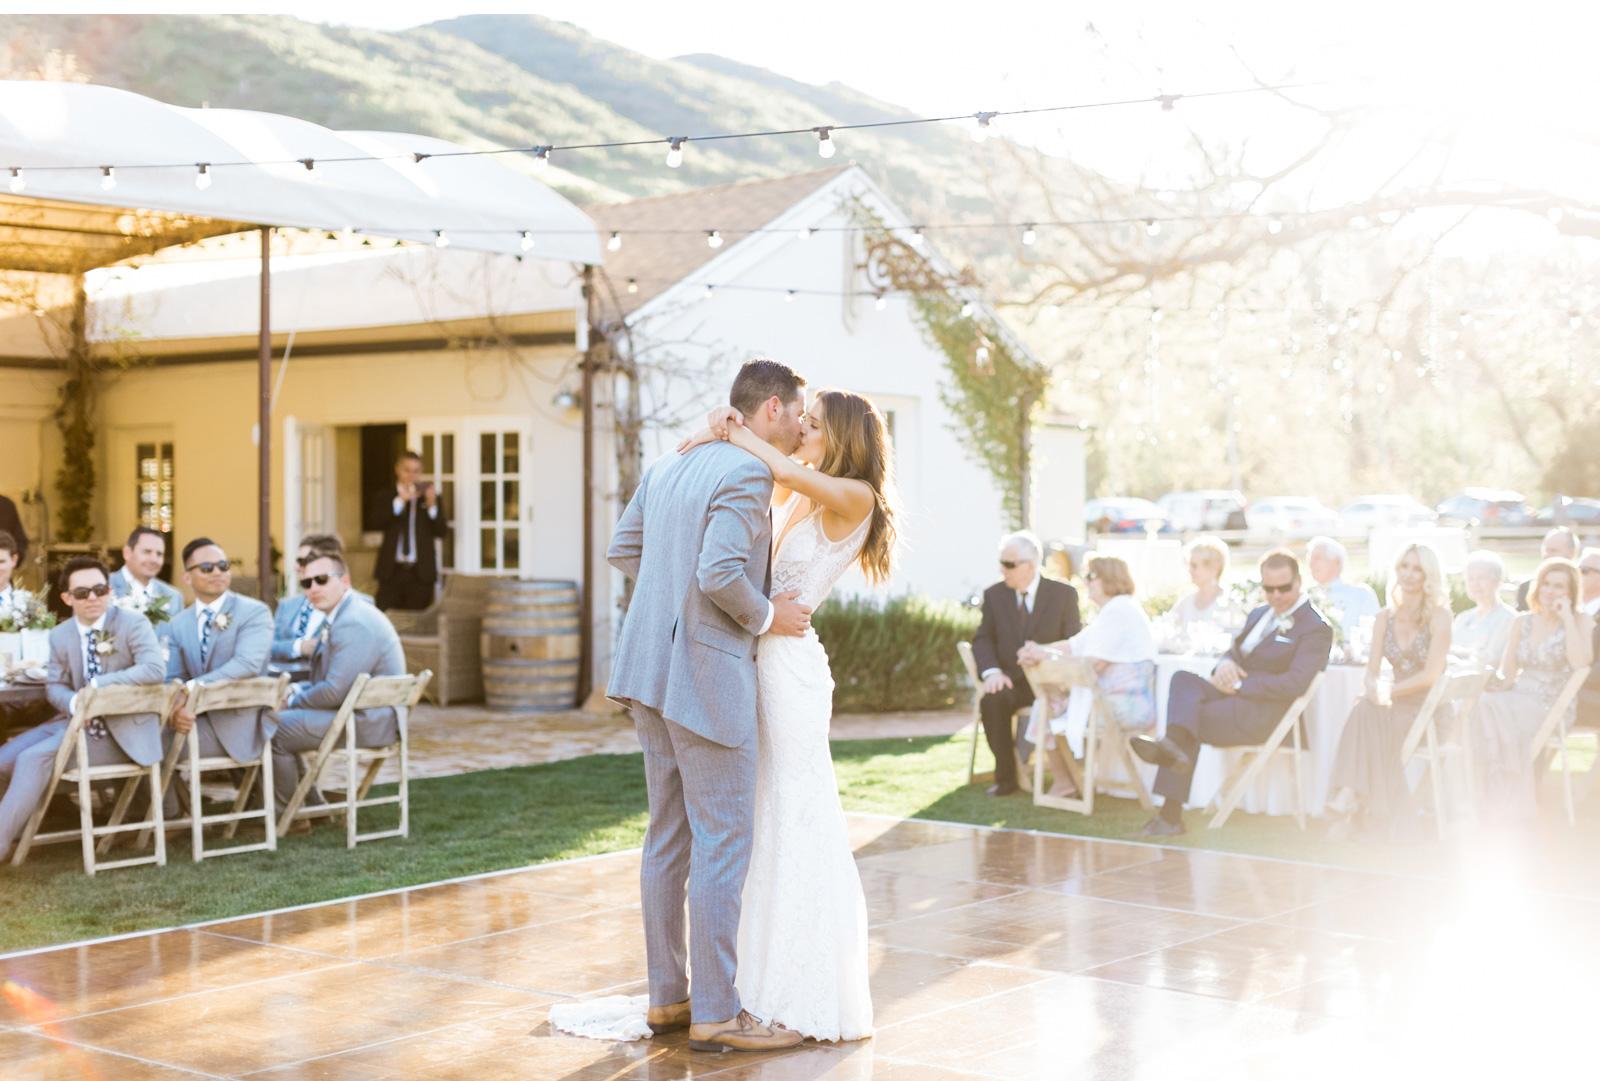 Triunfo-Creek-Malibu-Wedding-Natalie-Schutt-Photography-Couture-Events-Style-Me-Pretty_06.jpg